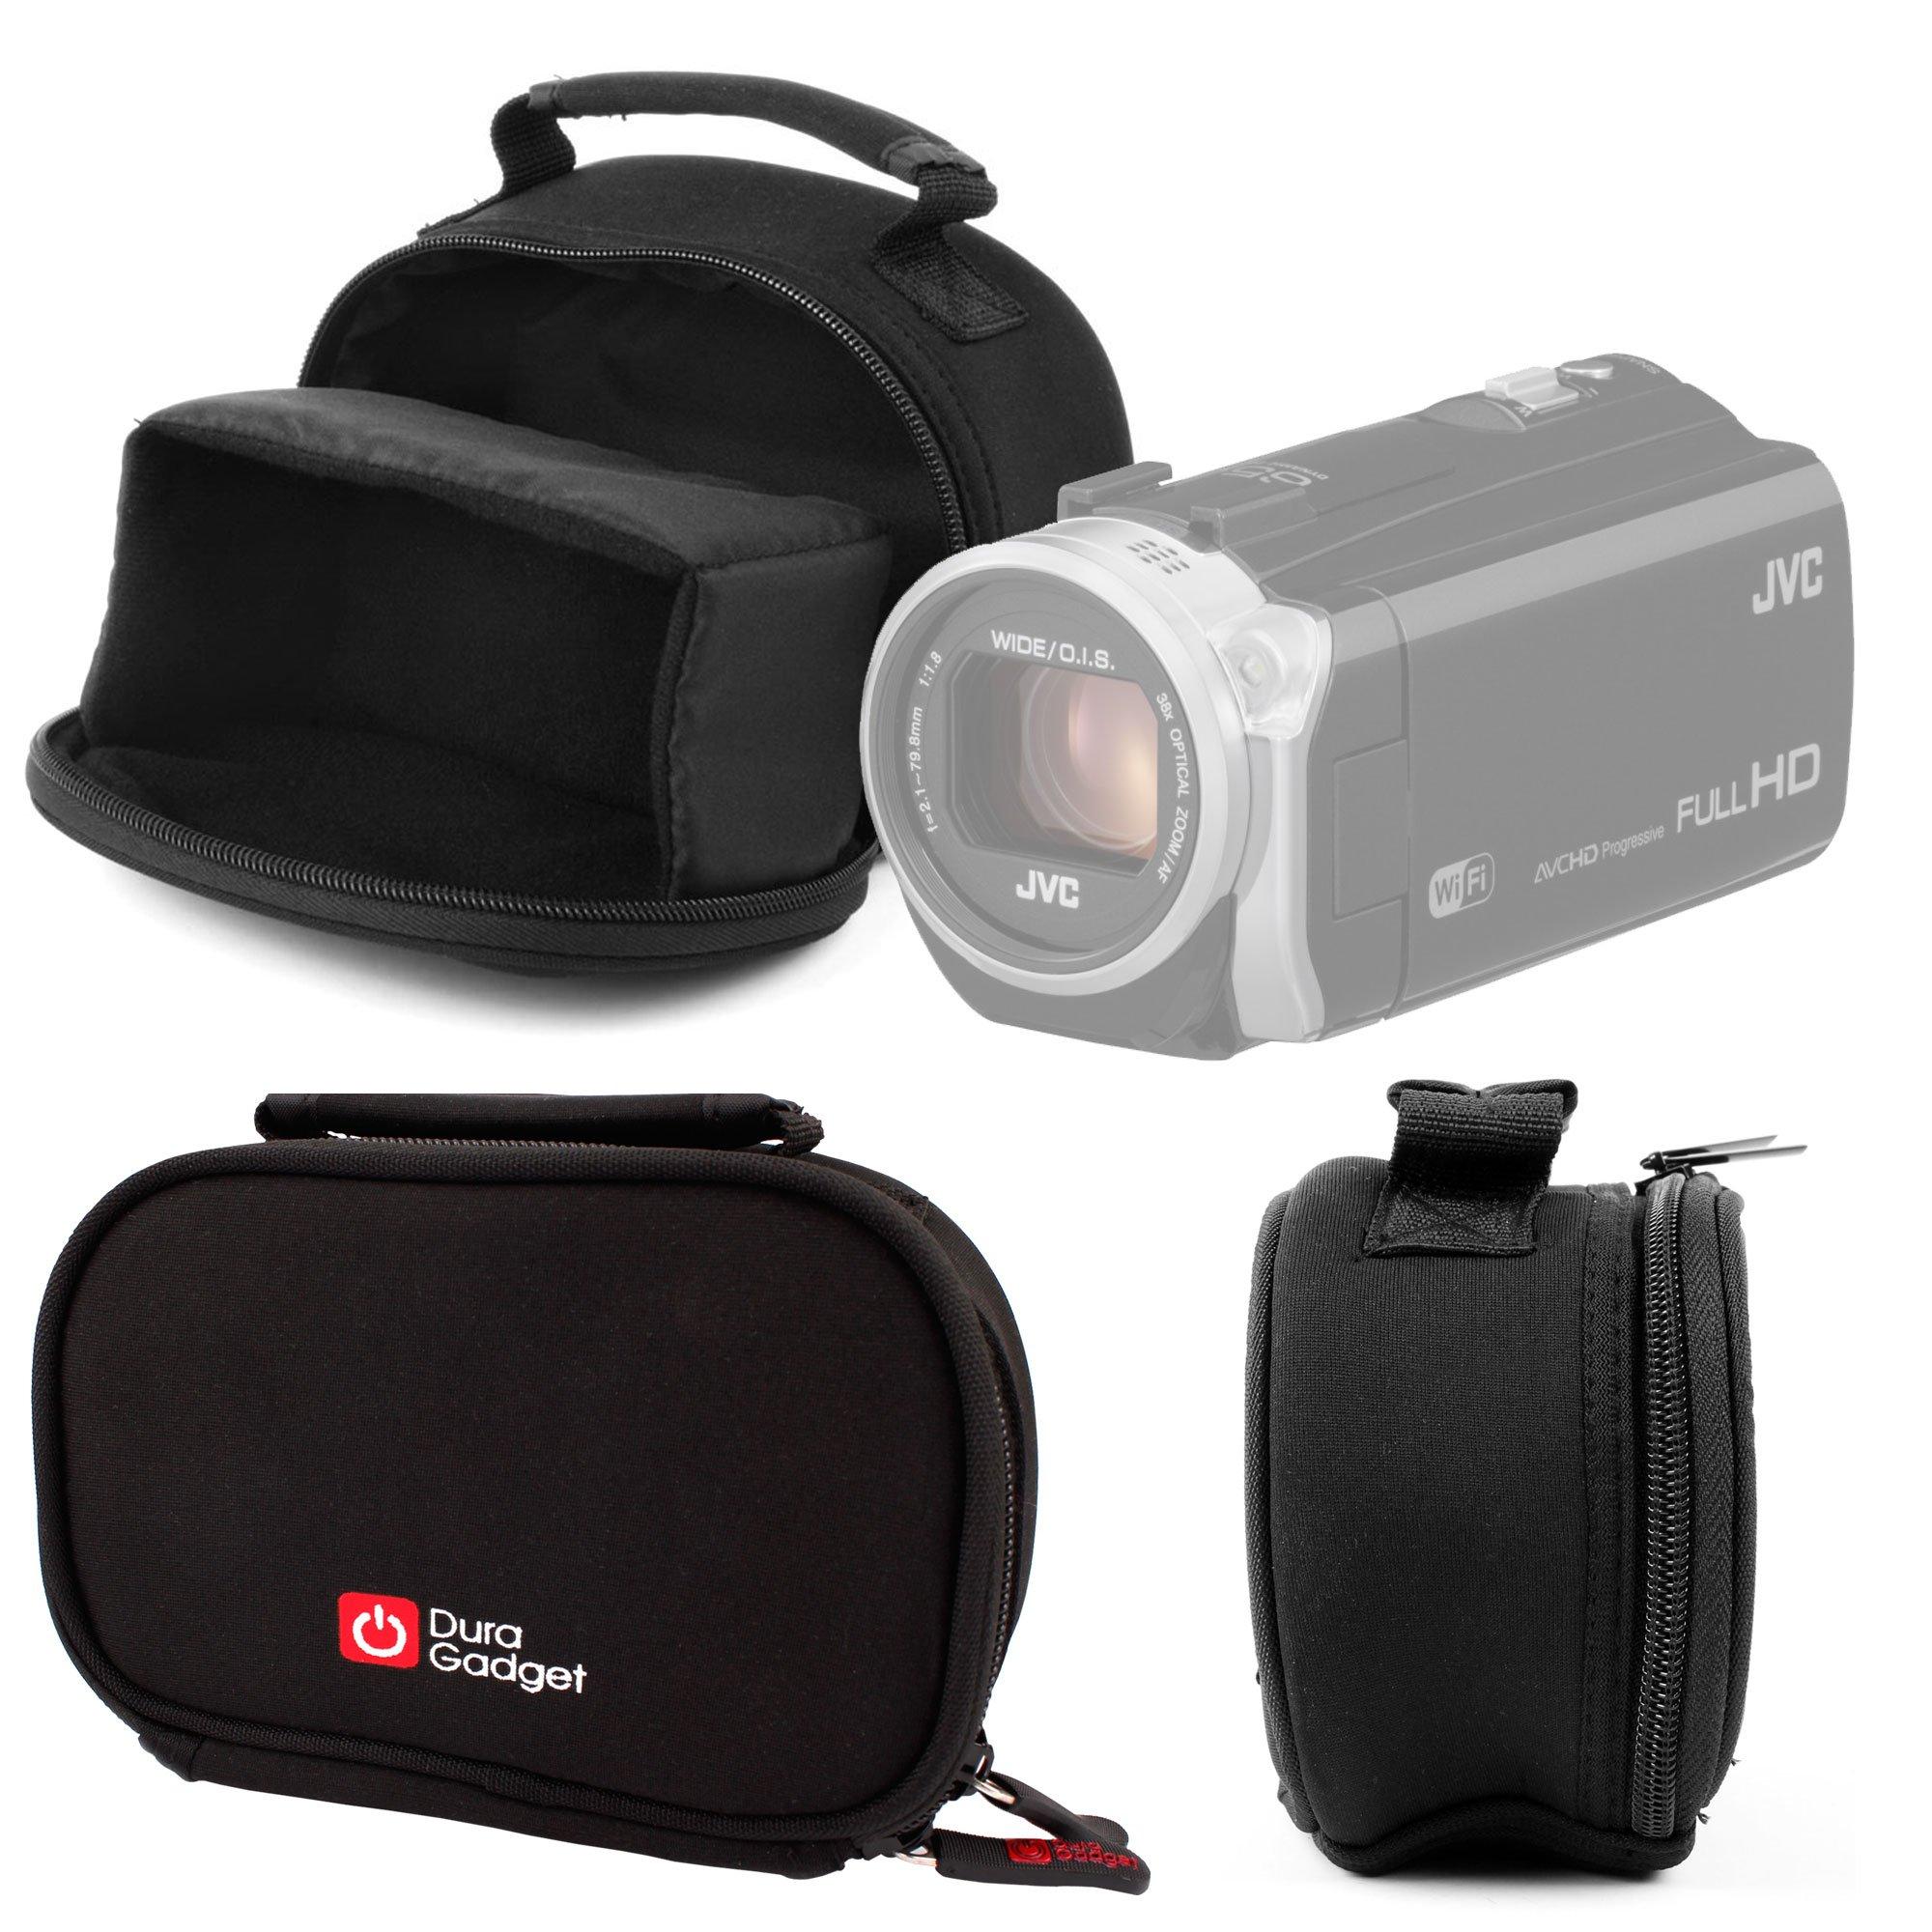 DURAGADGET Water-Resistant Digital Video Camera Bag for JVC Everio GZ and MS Range